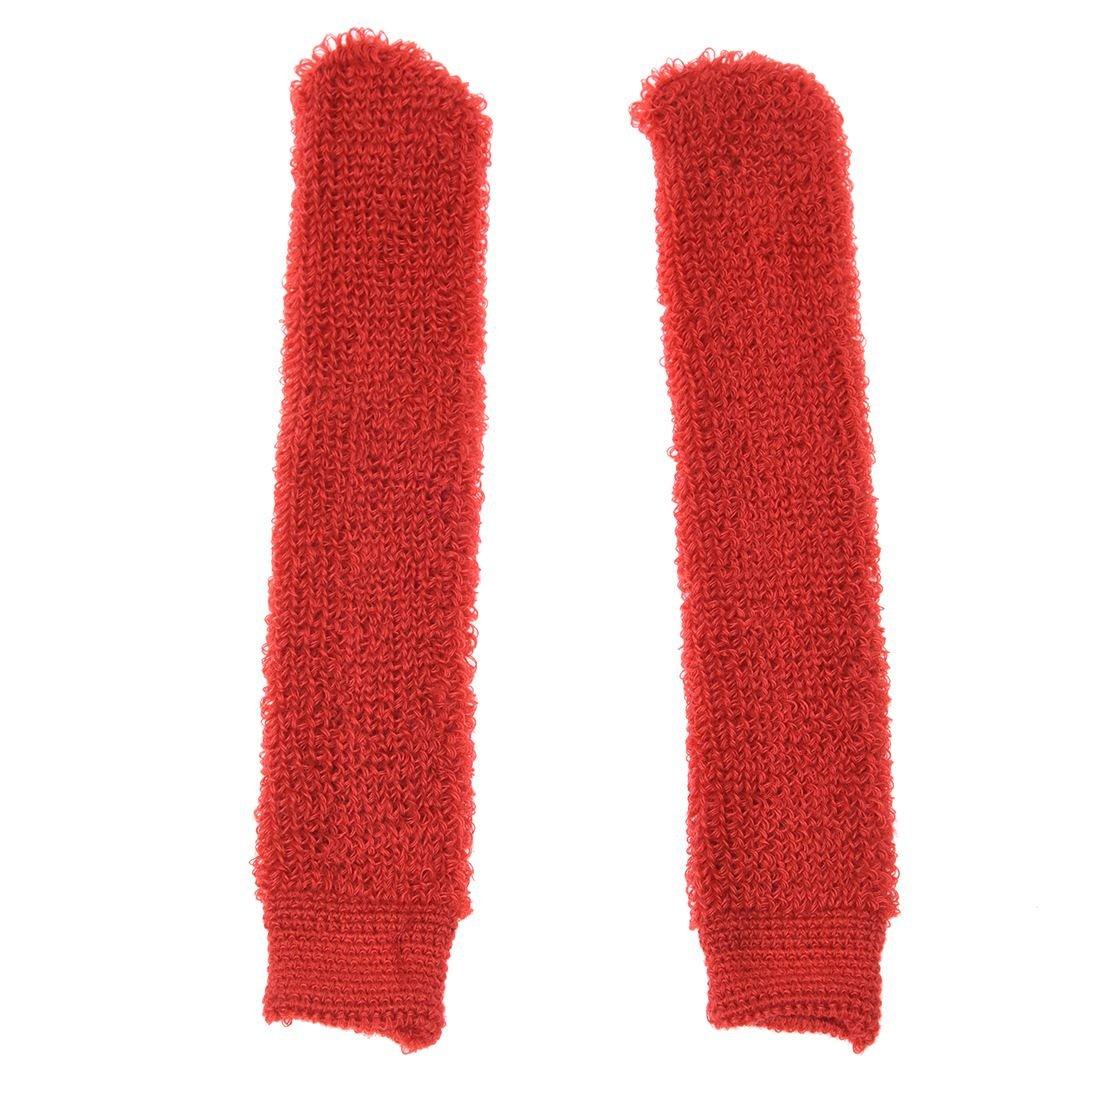 TOOGOO R Empunadura de tela de toalla toalla elastica antideslizante para raqueta de badminton